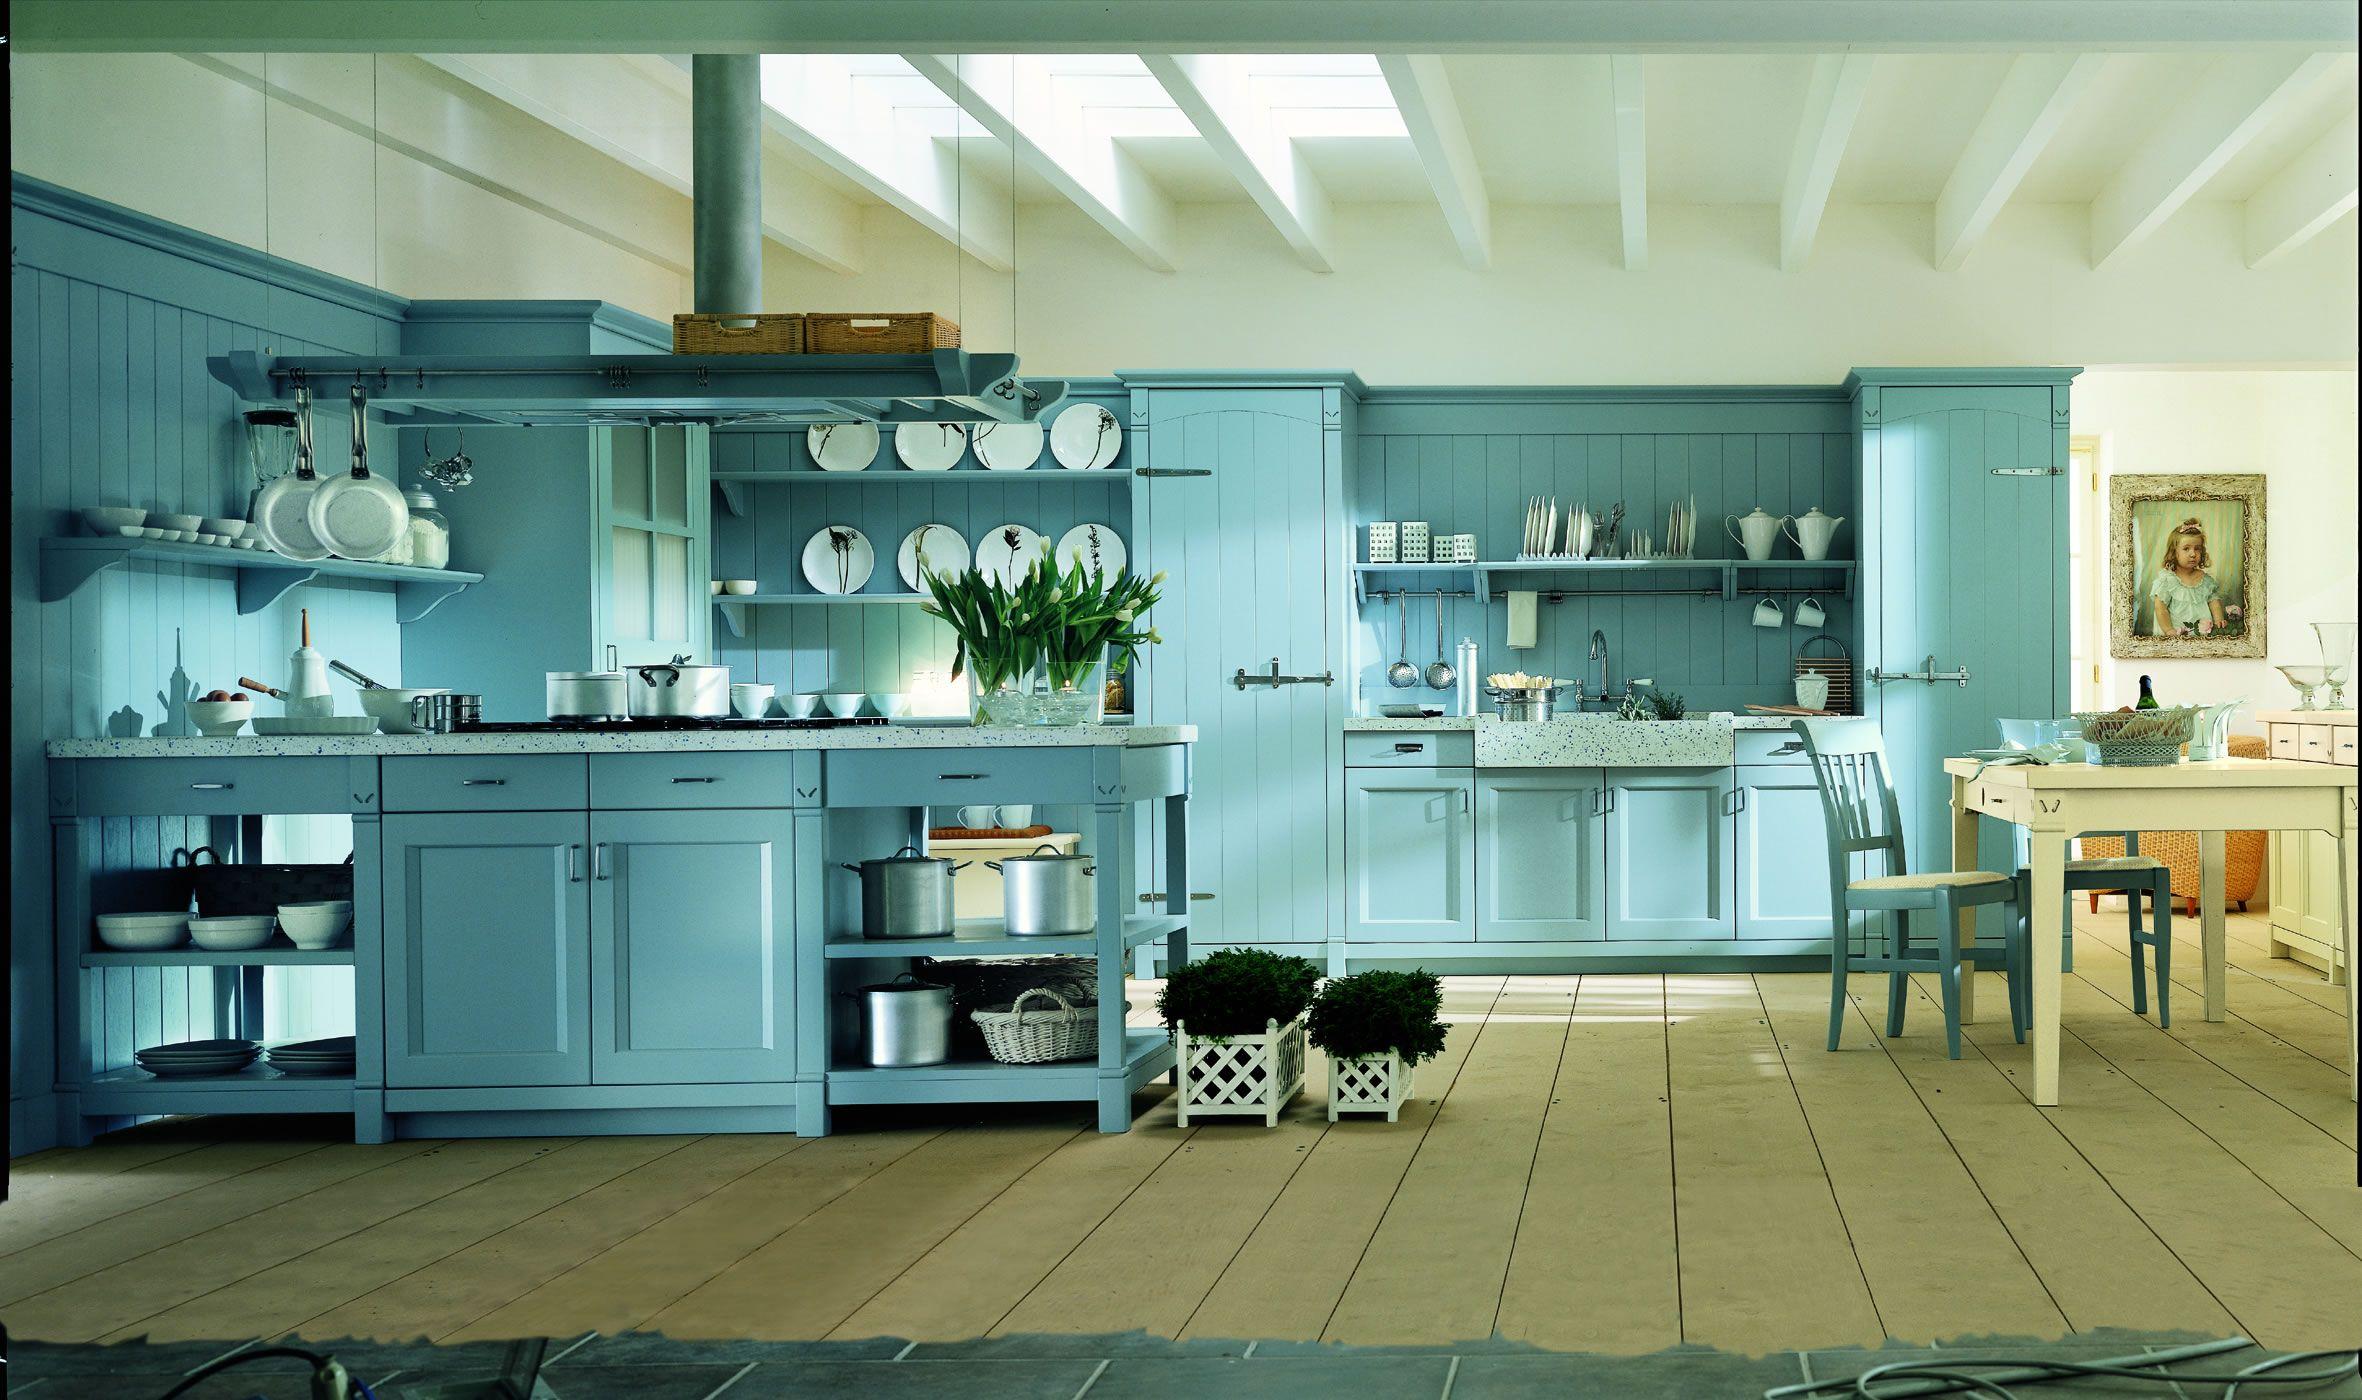 Kitchen + | Kitchen | Pinterest | Interiors